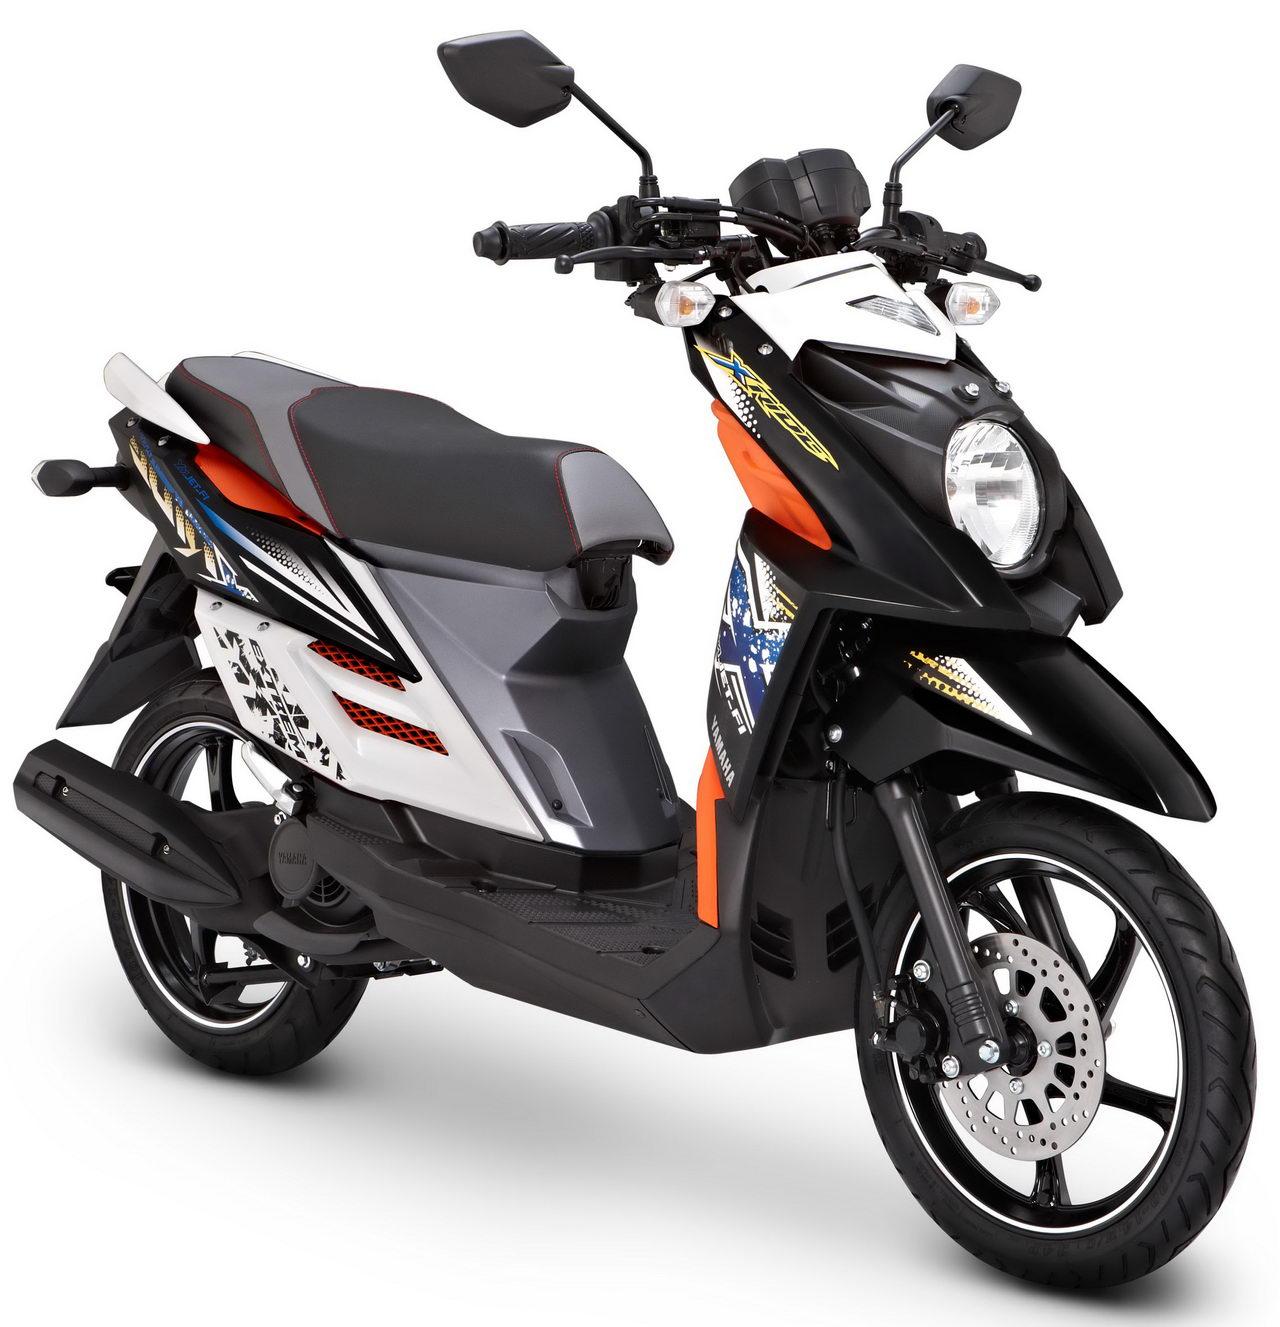 Harga Yamaha X Ride Dan Spesifikasi Terbaru 2020 Otomaniac